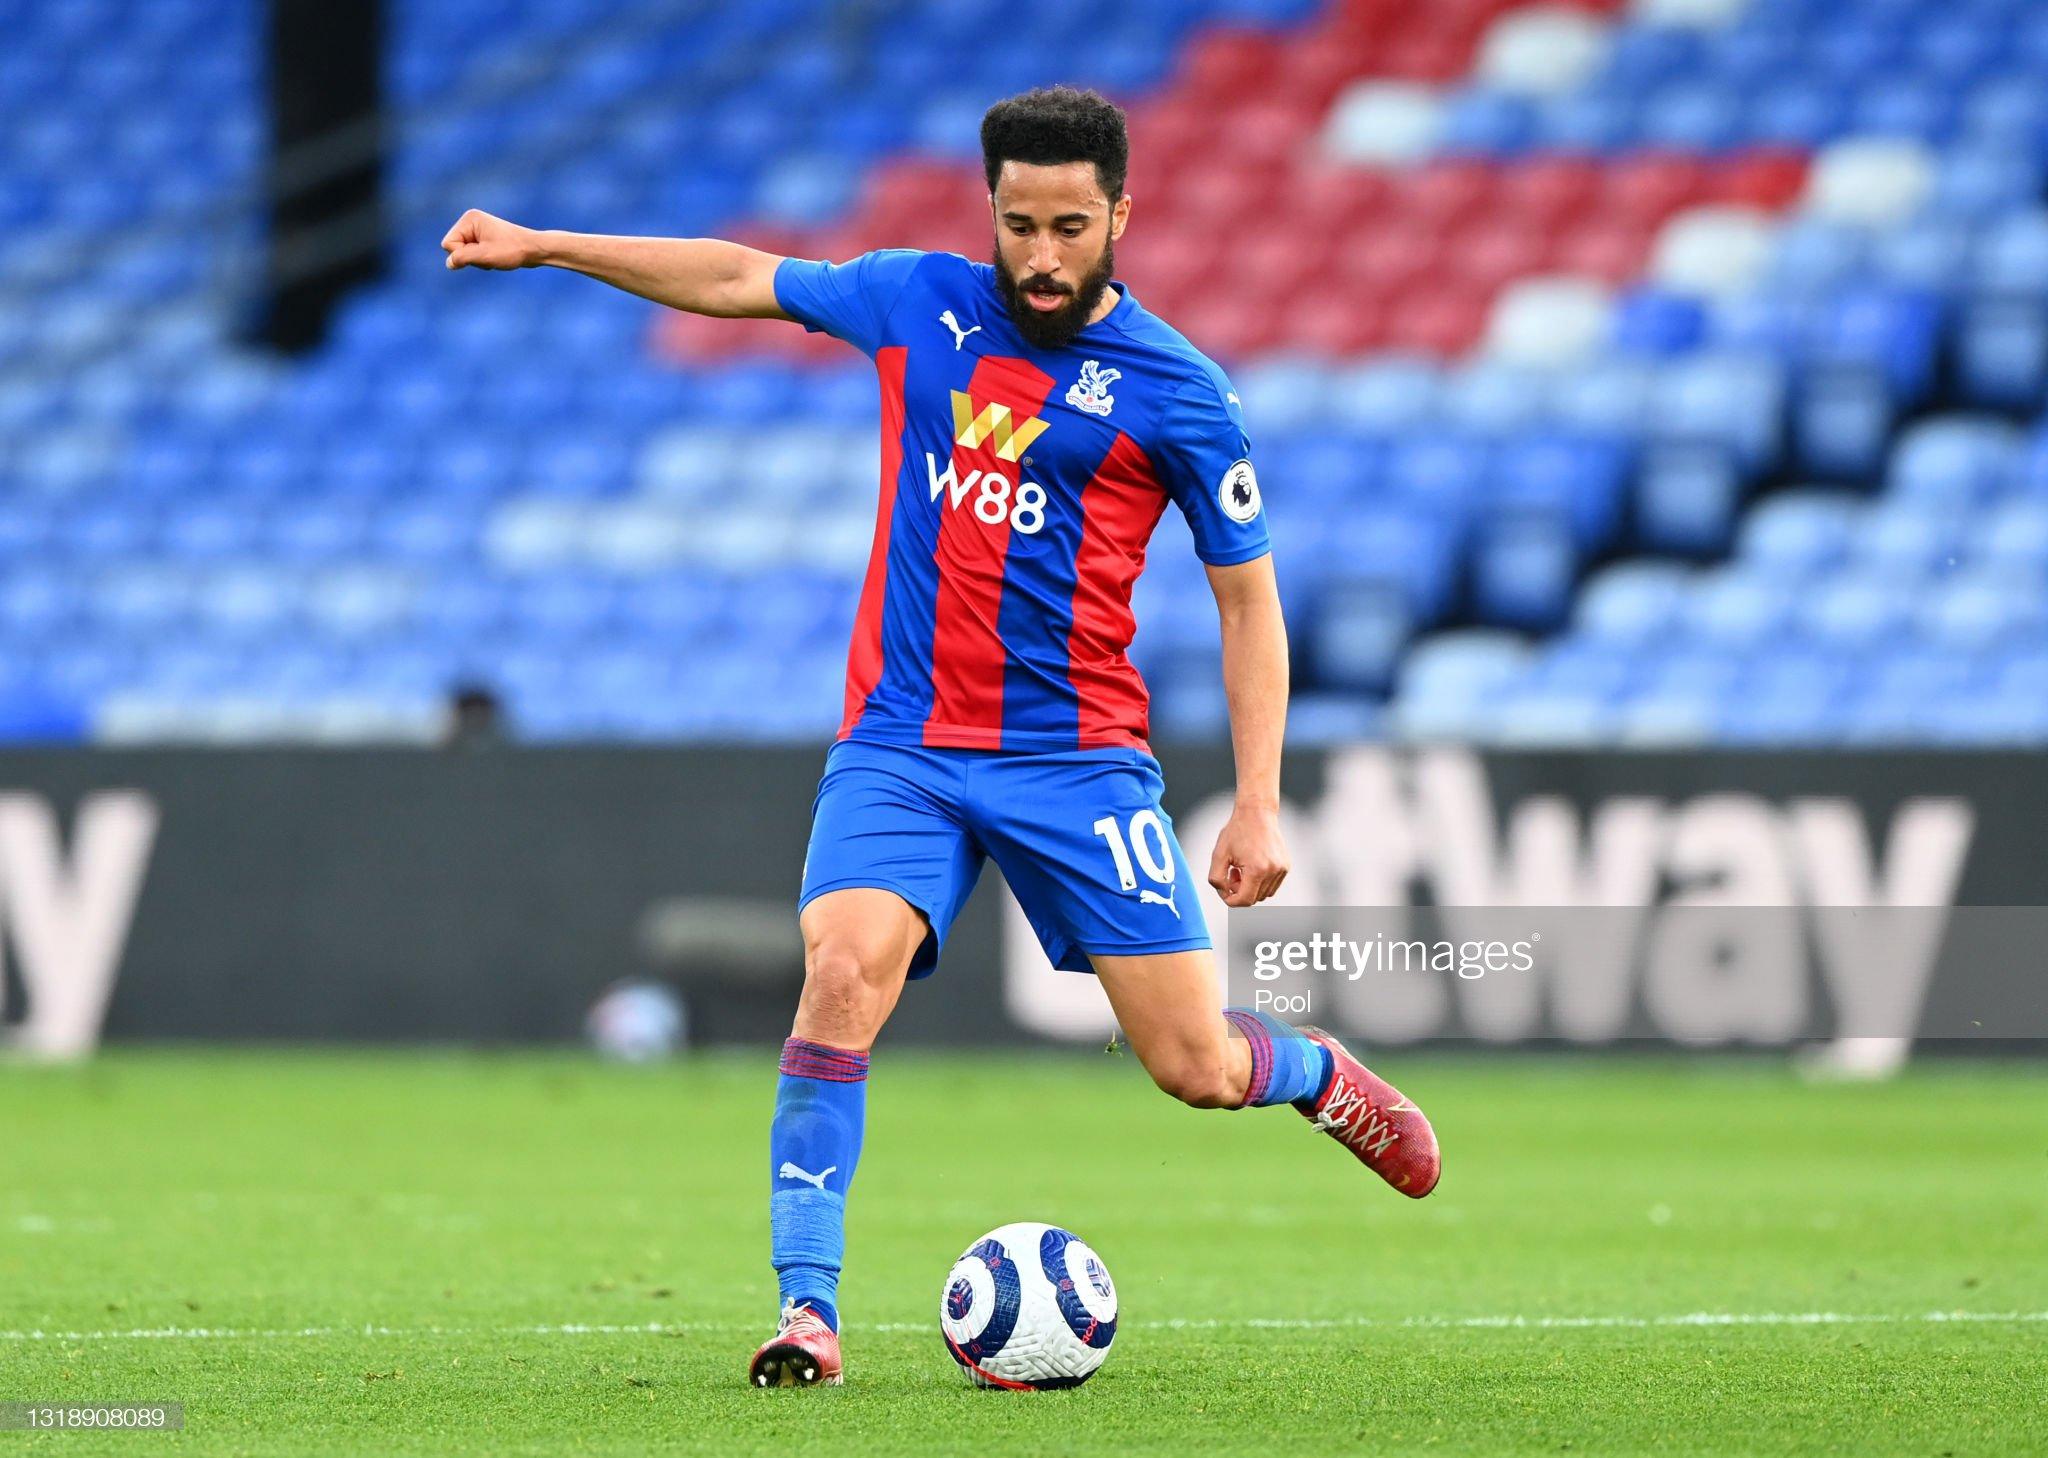 Everton's early summer transfer work makes sense